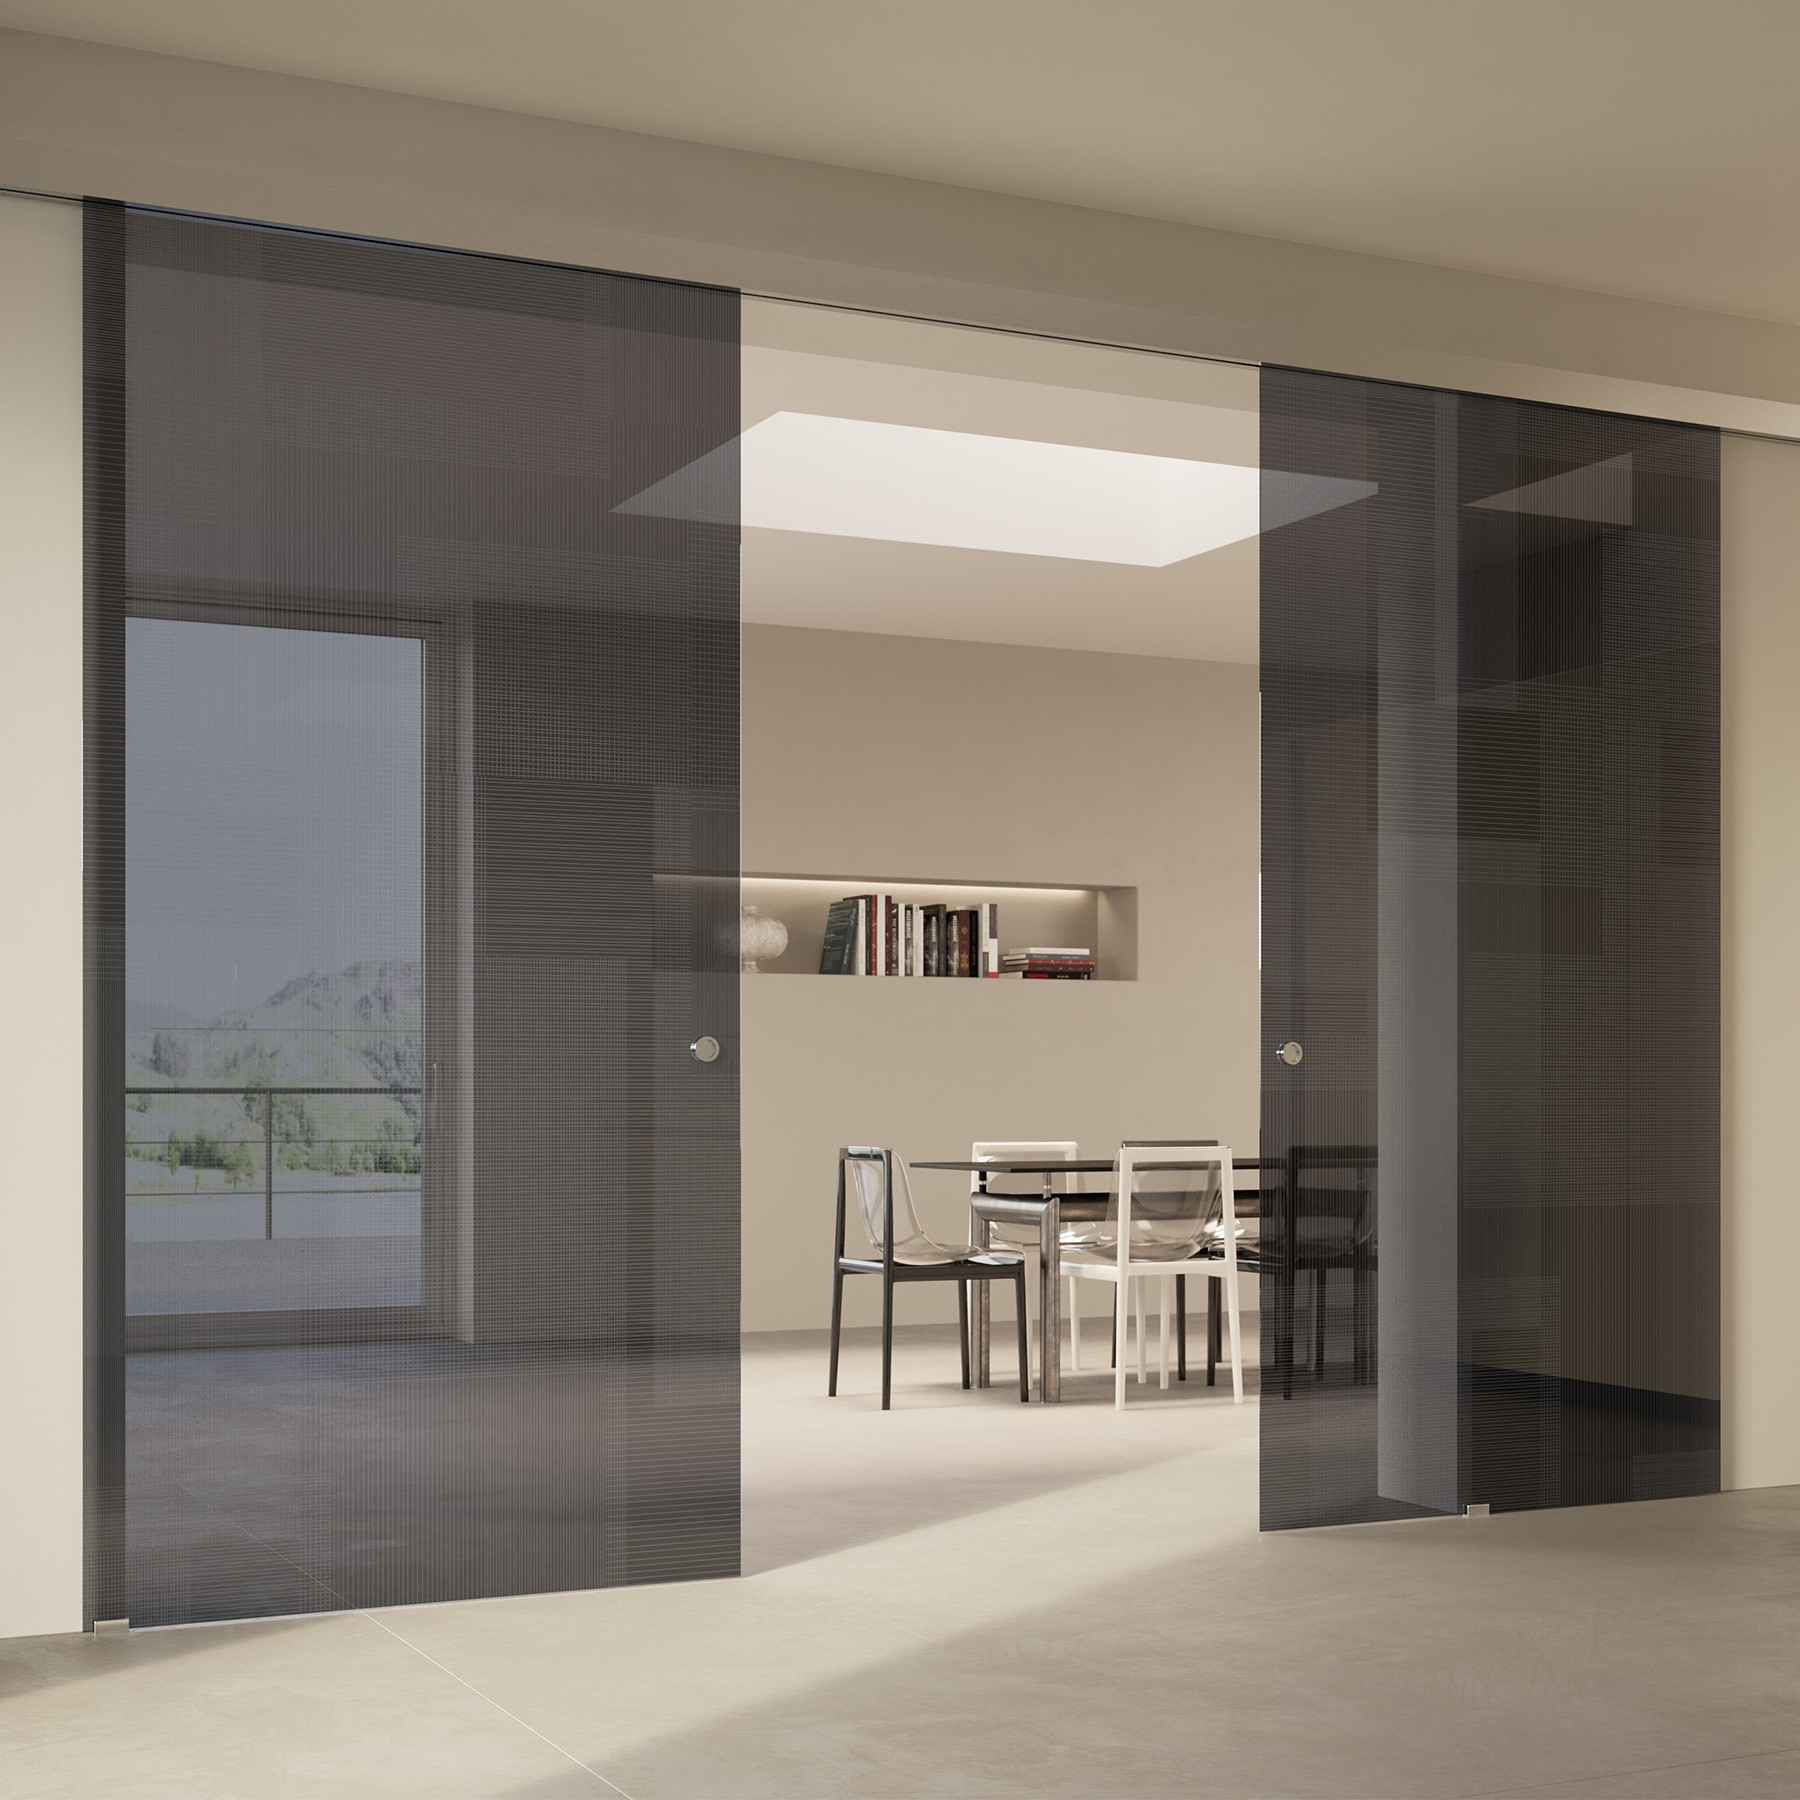 Scenario Visio with BIT 03 trasparente grigio glass